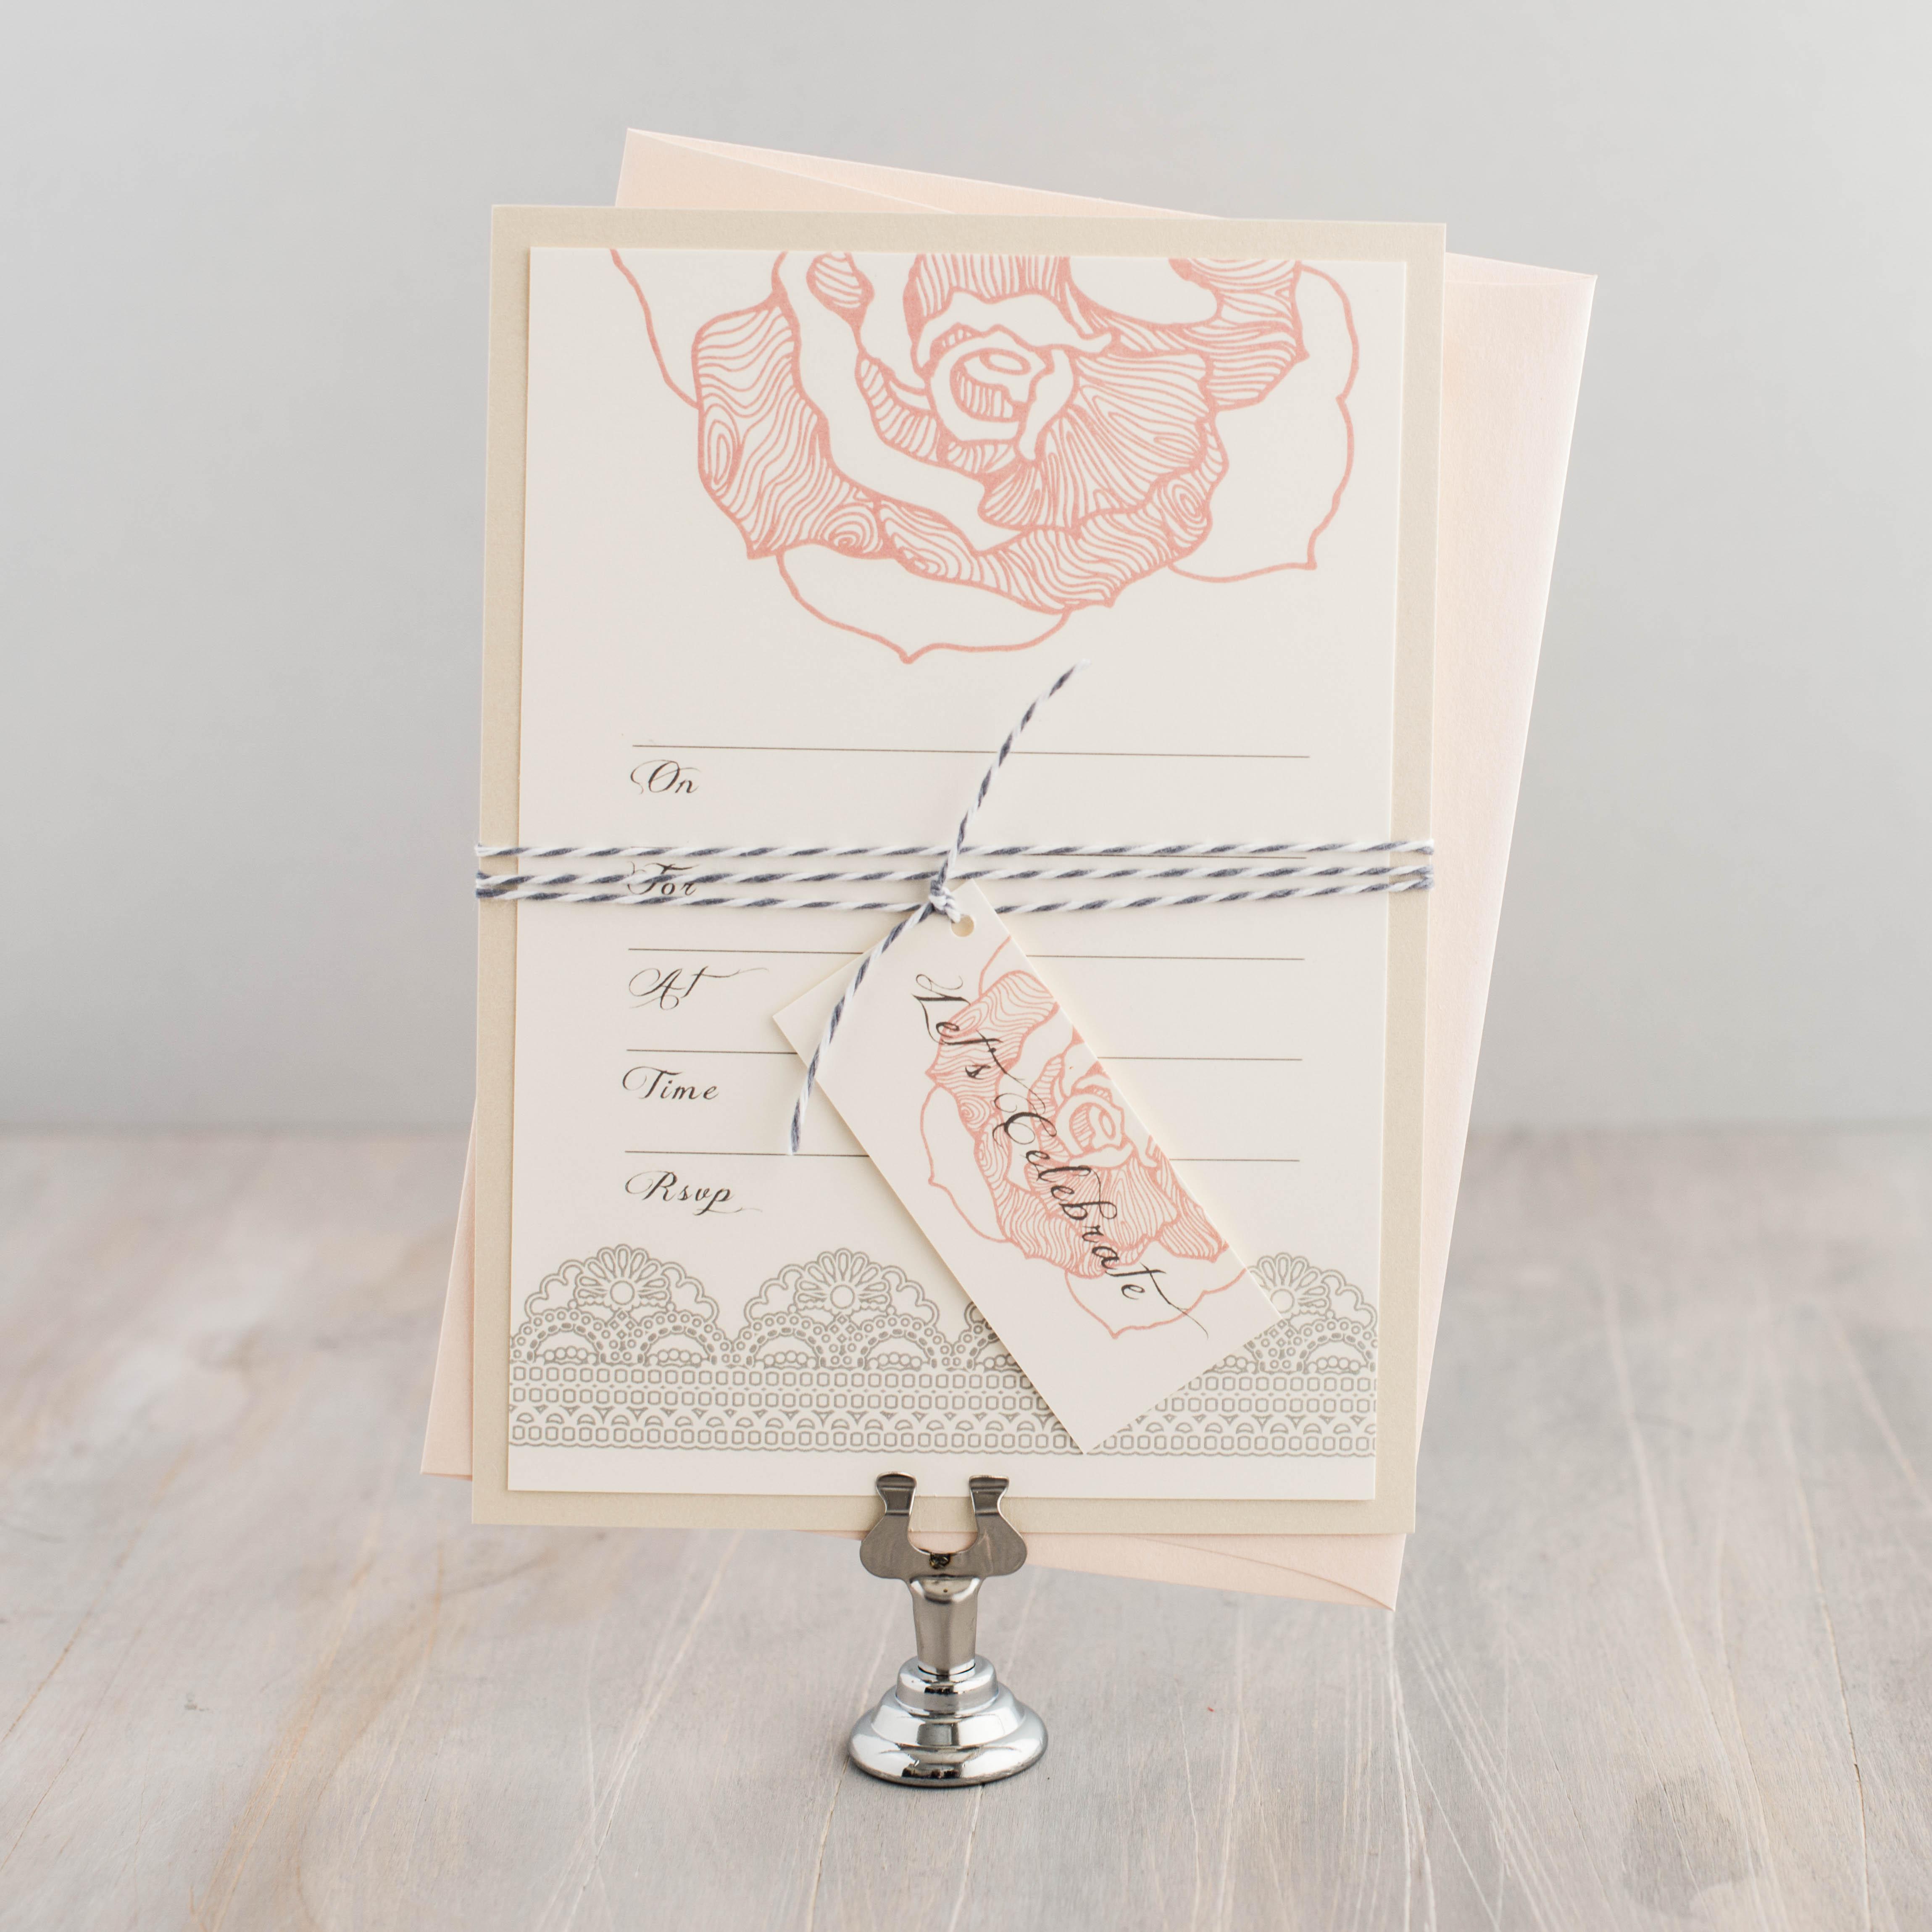 Ruffled Romance Fill In The Blank Wedding Invitations   Beacon Lane